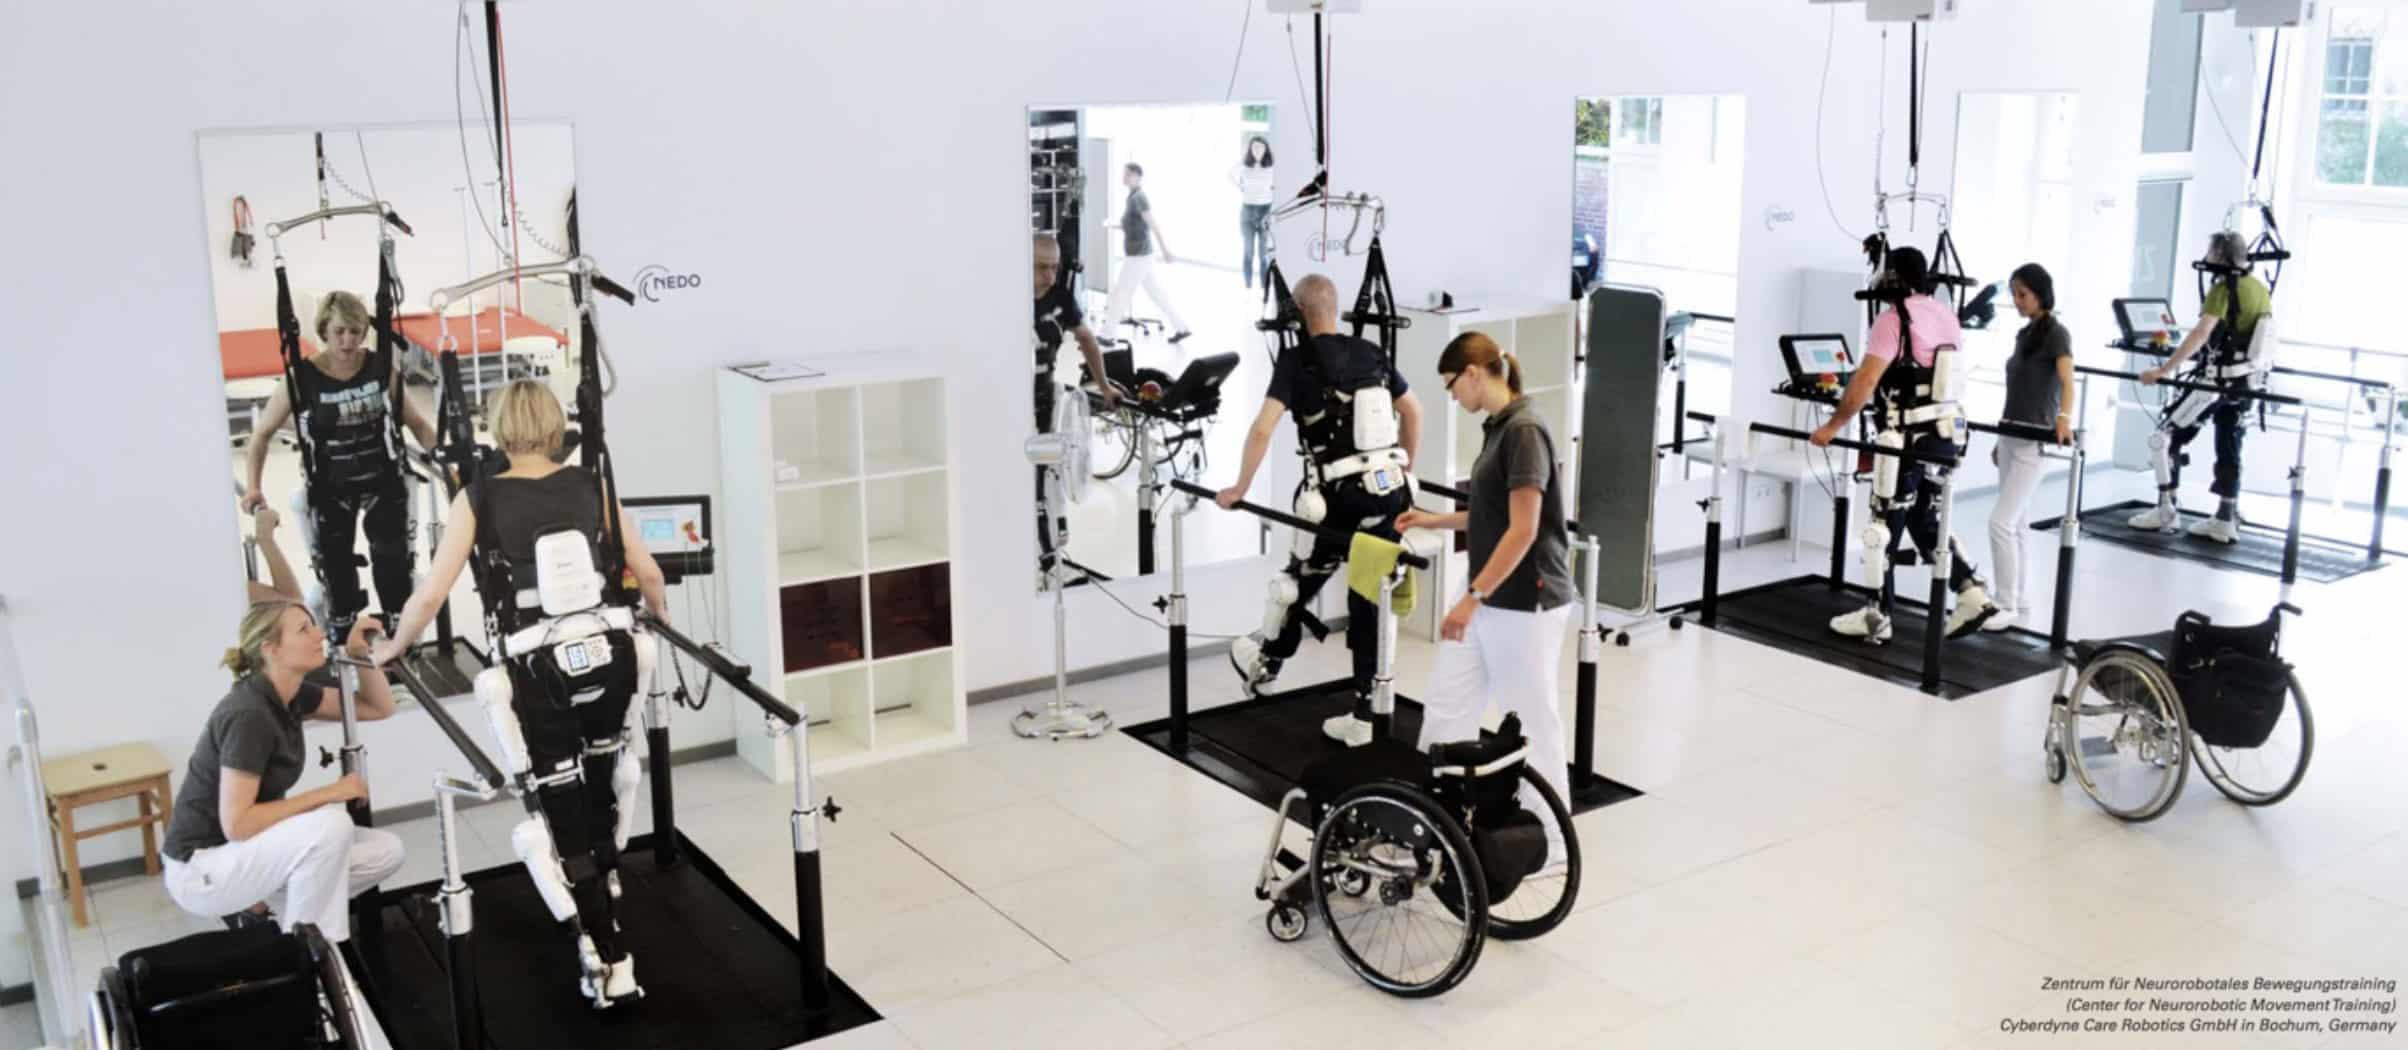 Cybernic Treatment using the Medical HAL Cyberdyne Care Robotics Bochum Germany copy